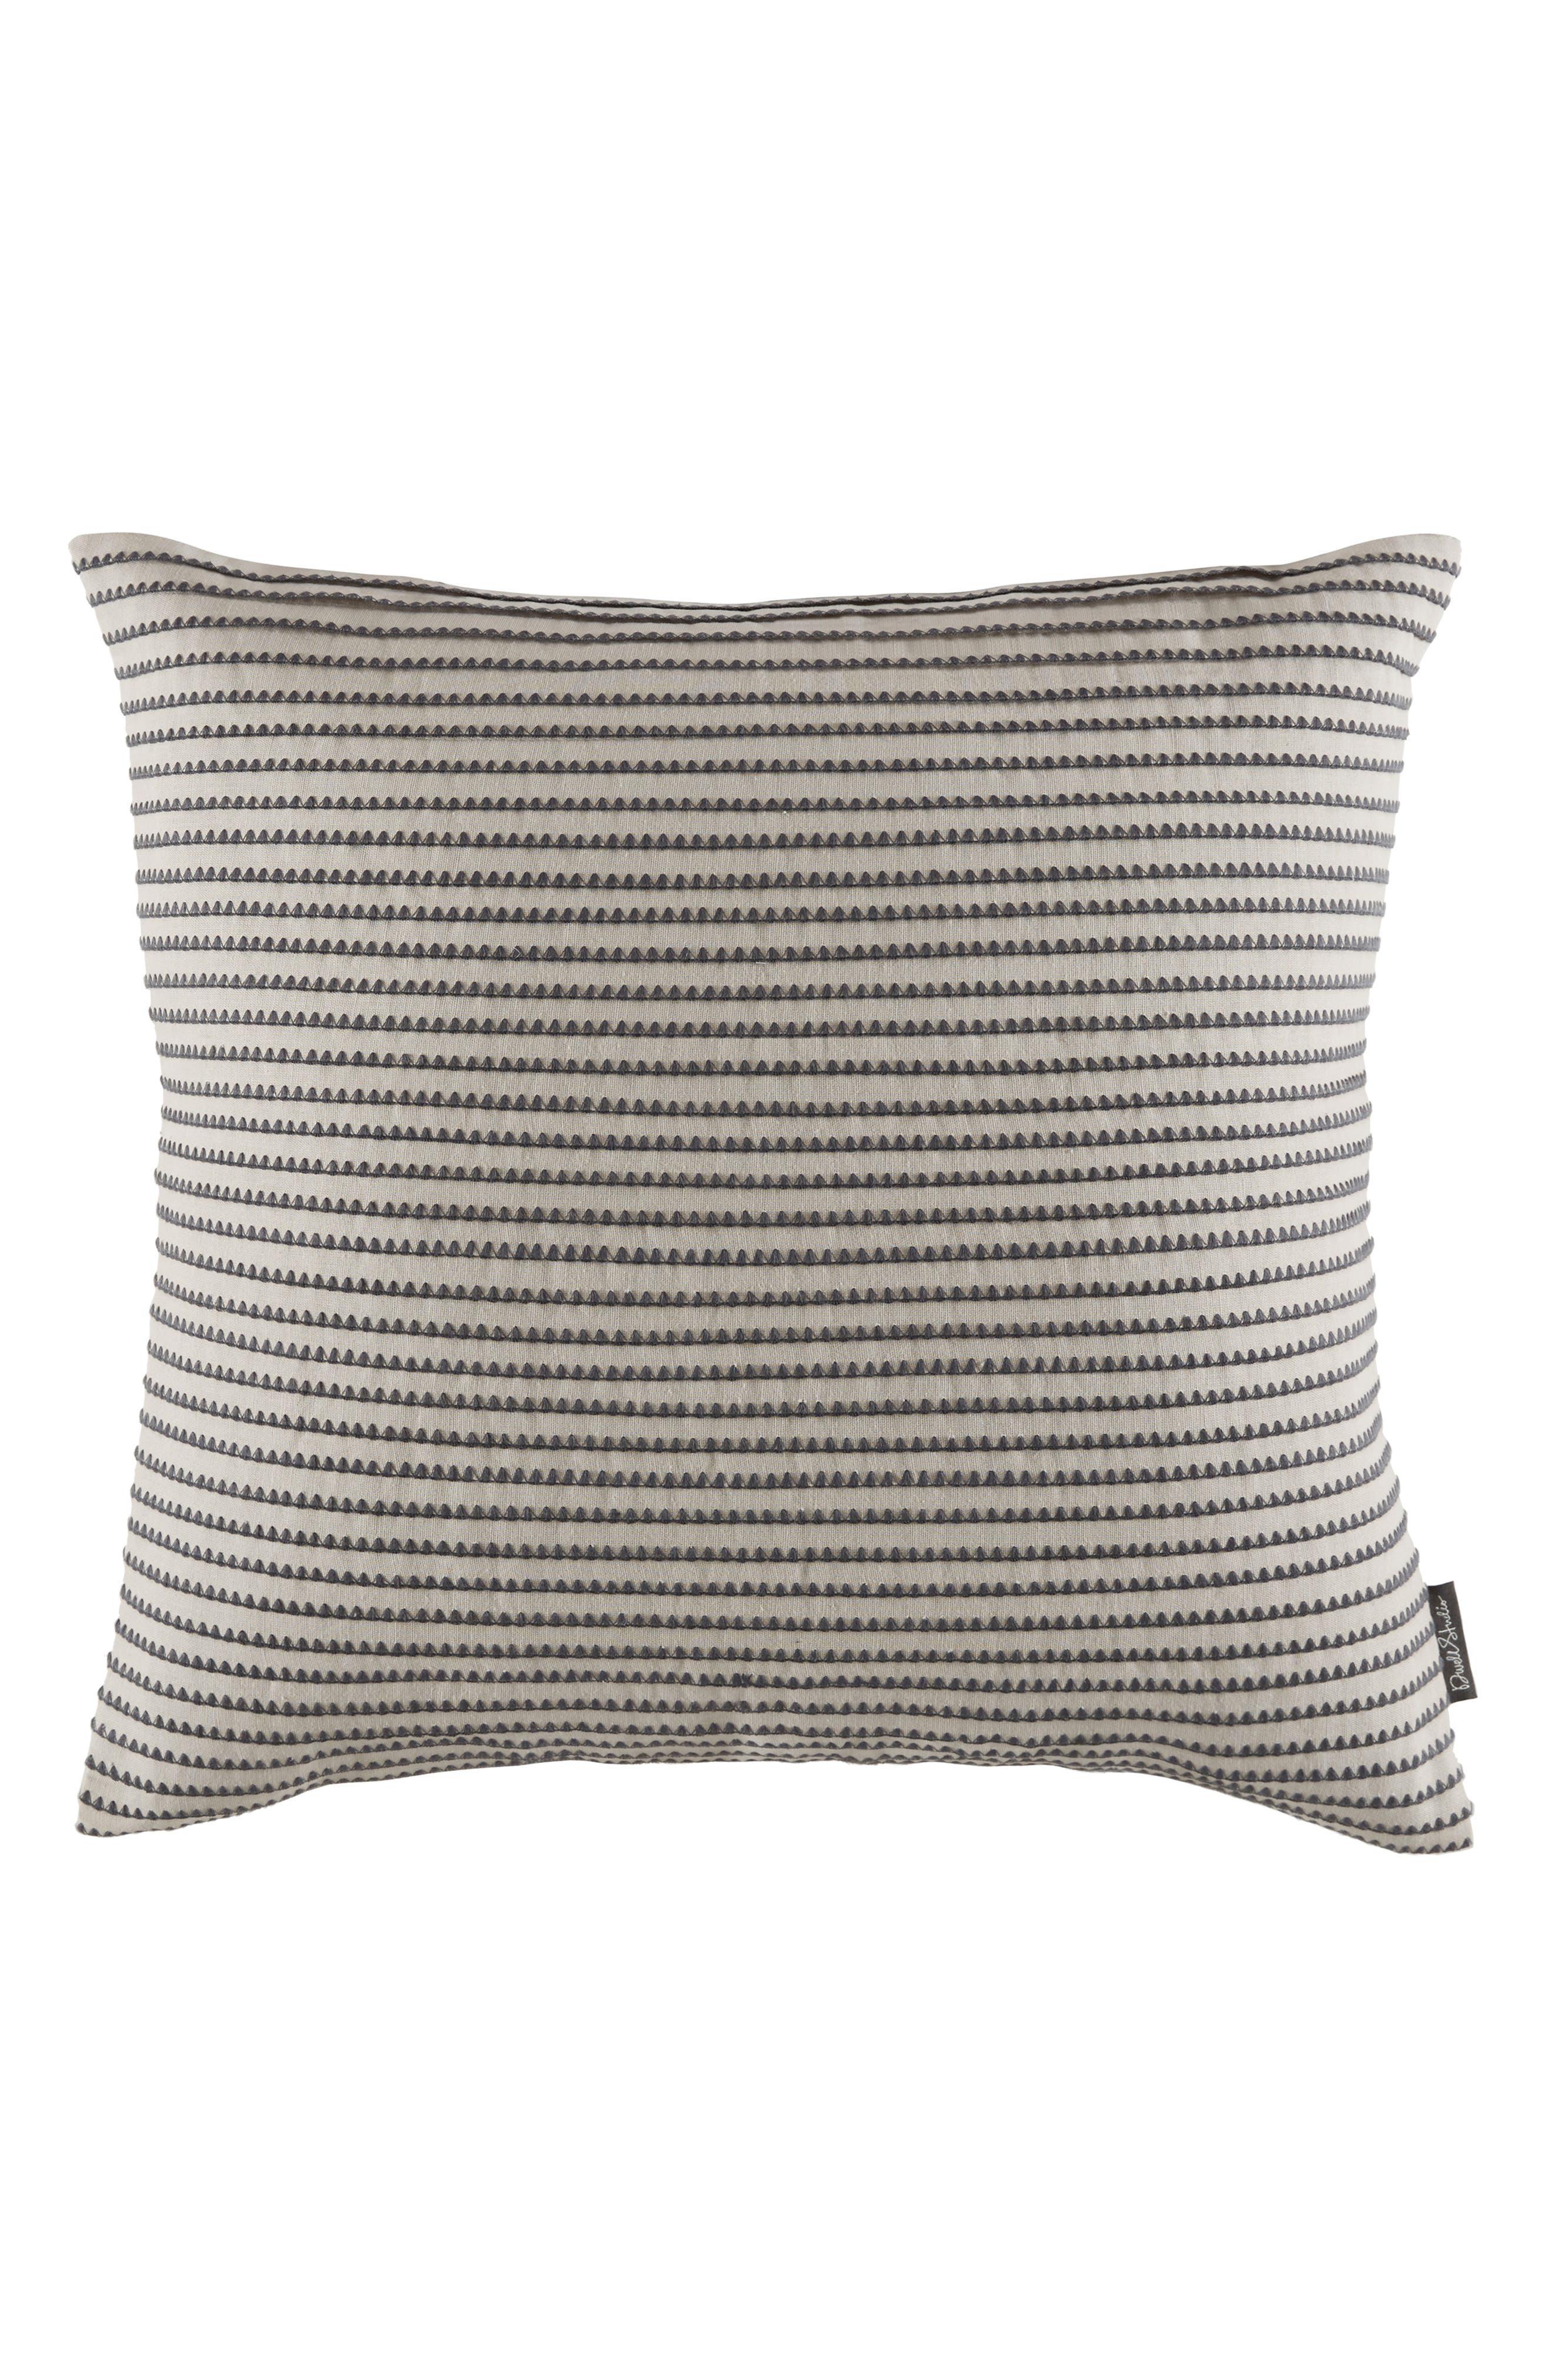 Sloane Accent Pillow,                         Main,                         color, 020